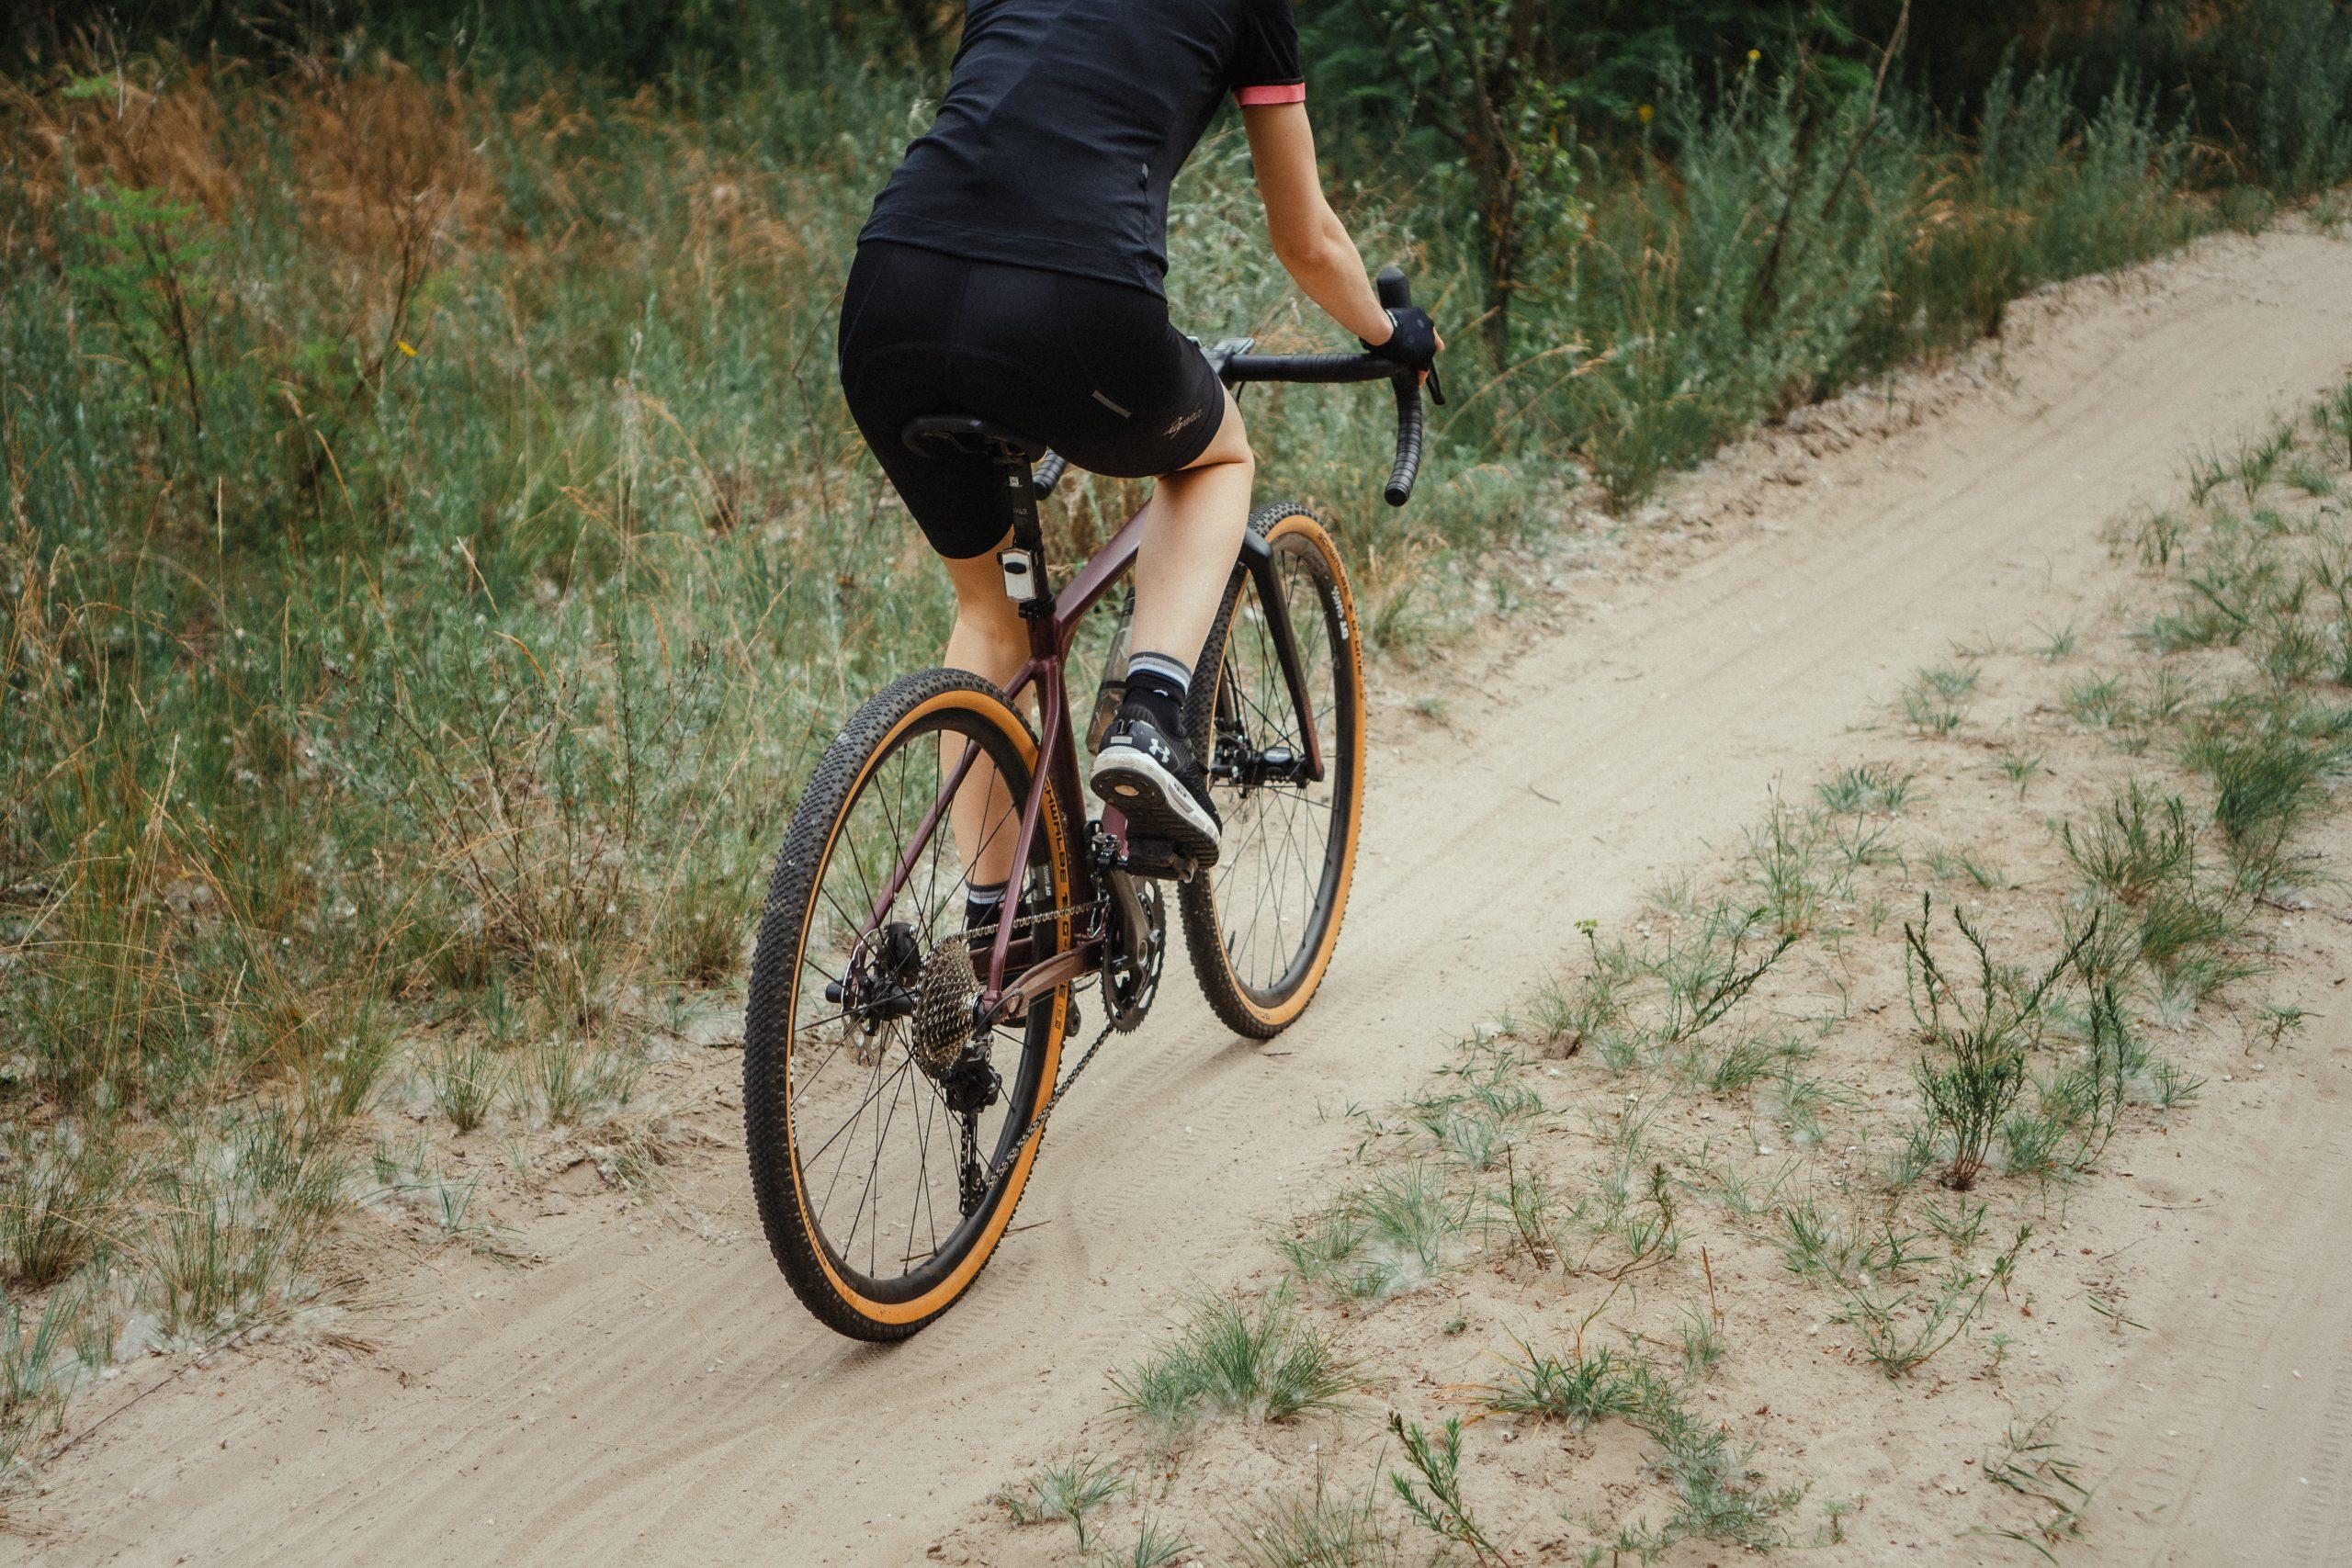 victor xok ztryiOSM0cg unsplash scaled - Skal racercykling være din næste sportsgren?